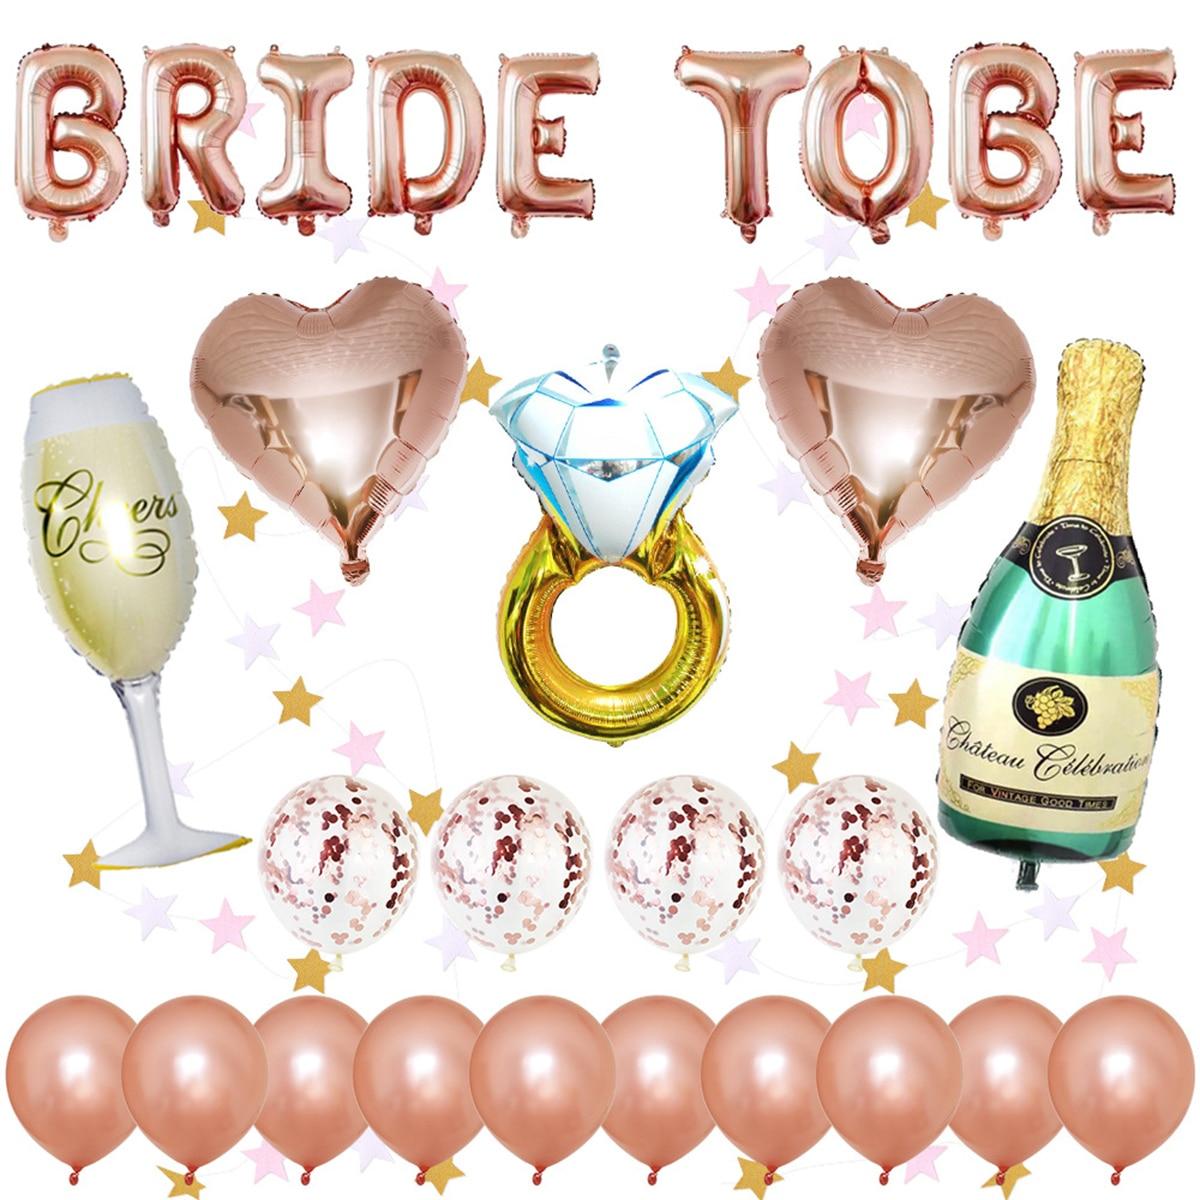 Bachelorette Party Wedding Decor Bridal Shower Supply Rose Gold Foil Balloons Kit Hen Party Decoration Bride Shoulder Strap